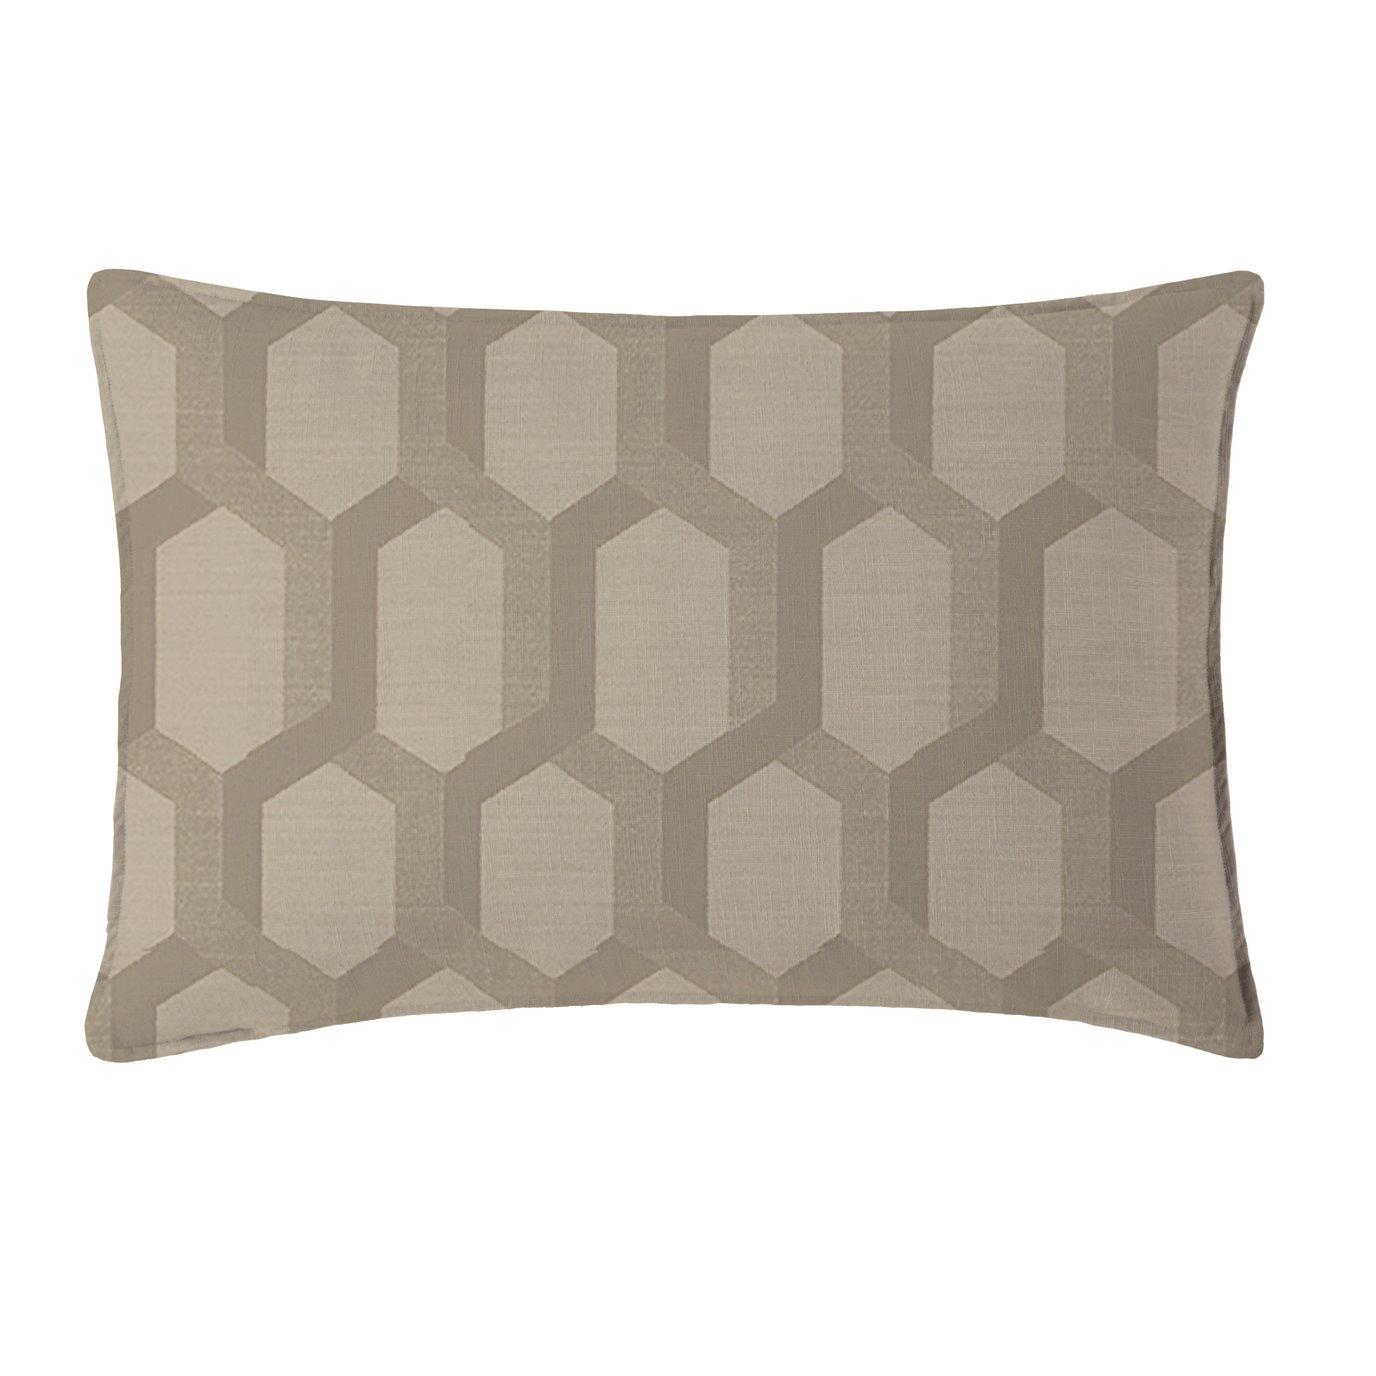 Maidstone Taupe Pillow Sham Standard/Queen